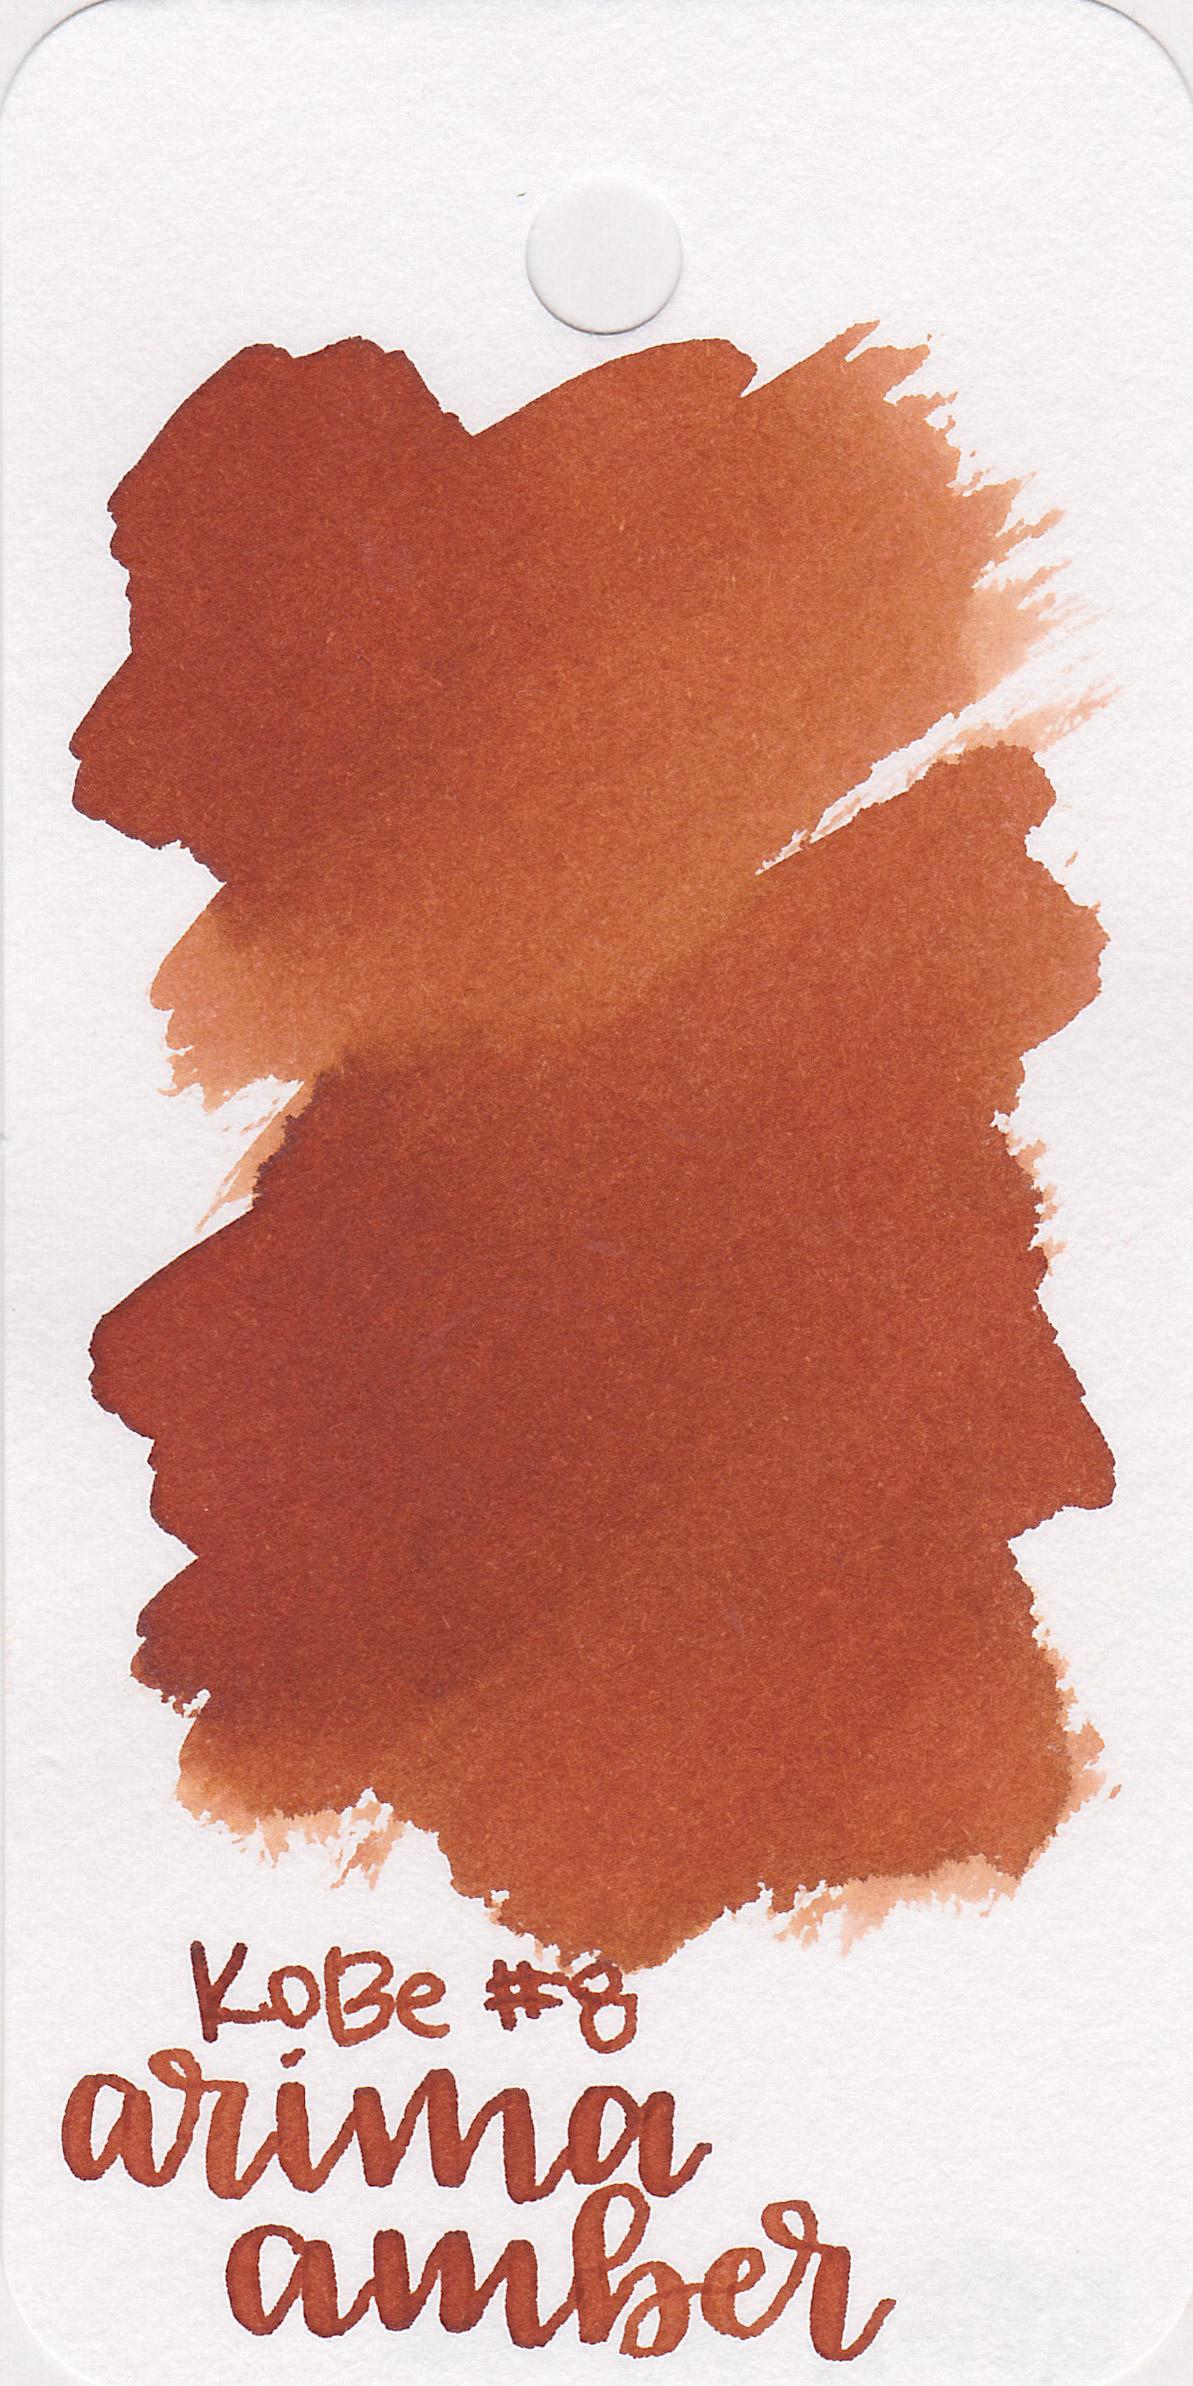 nk-arima-amber-1.jpg